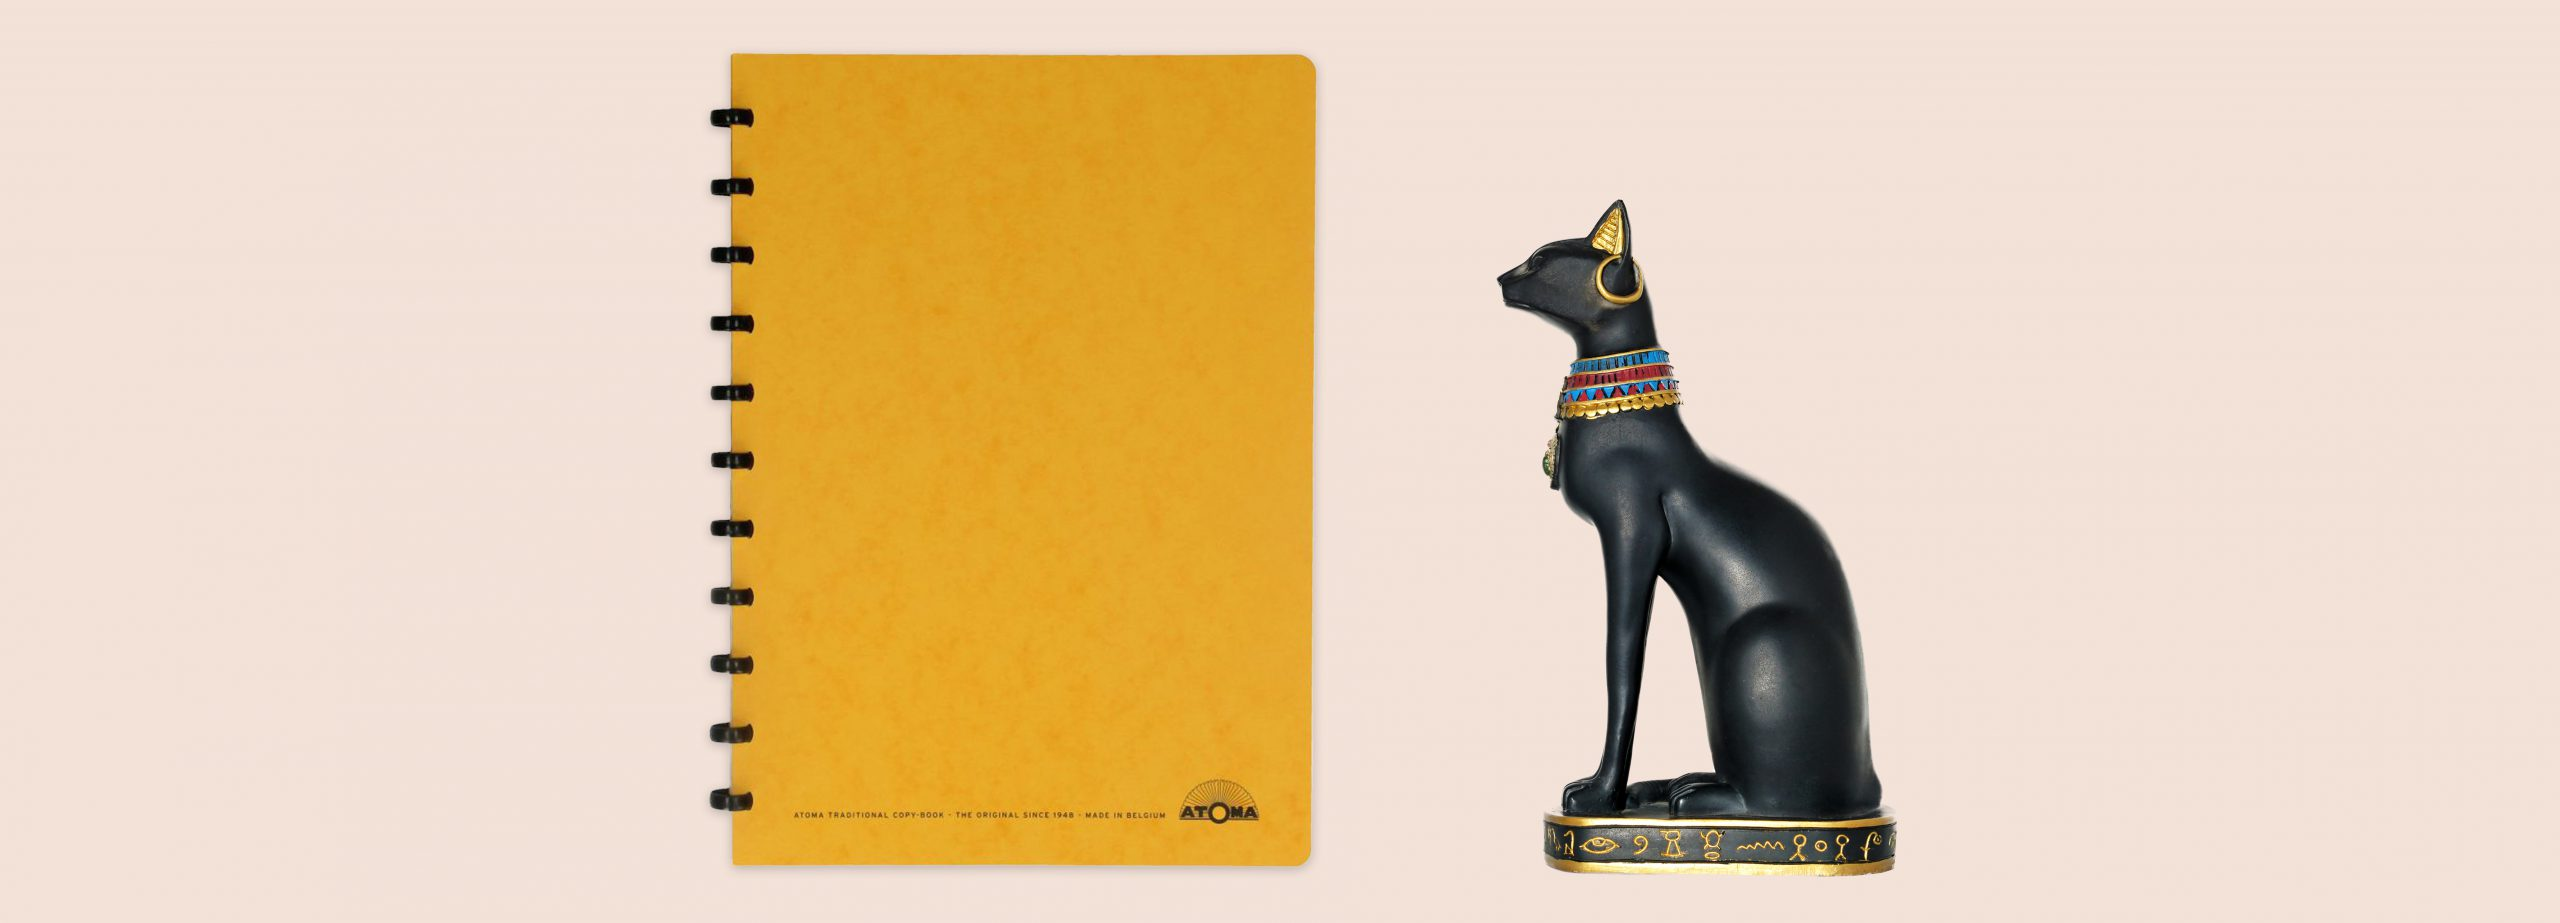 Atoma - Traditional Colours Cardboard